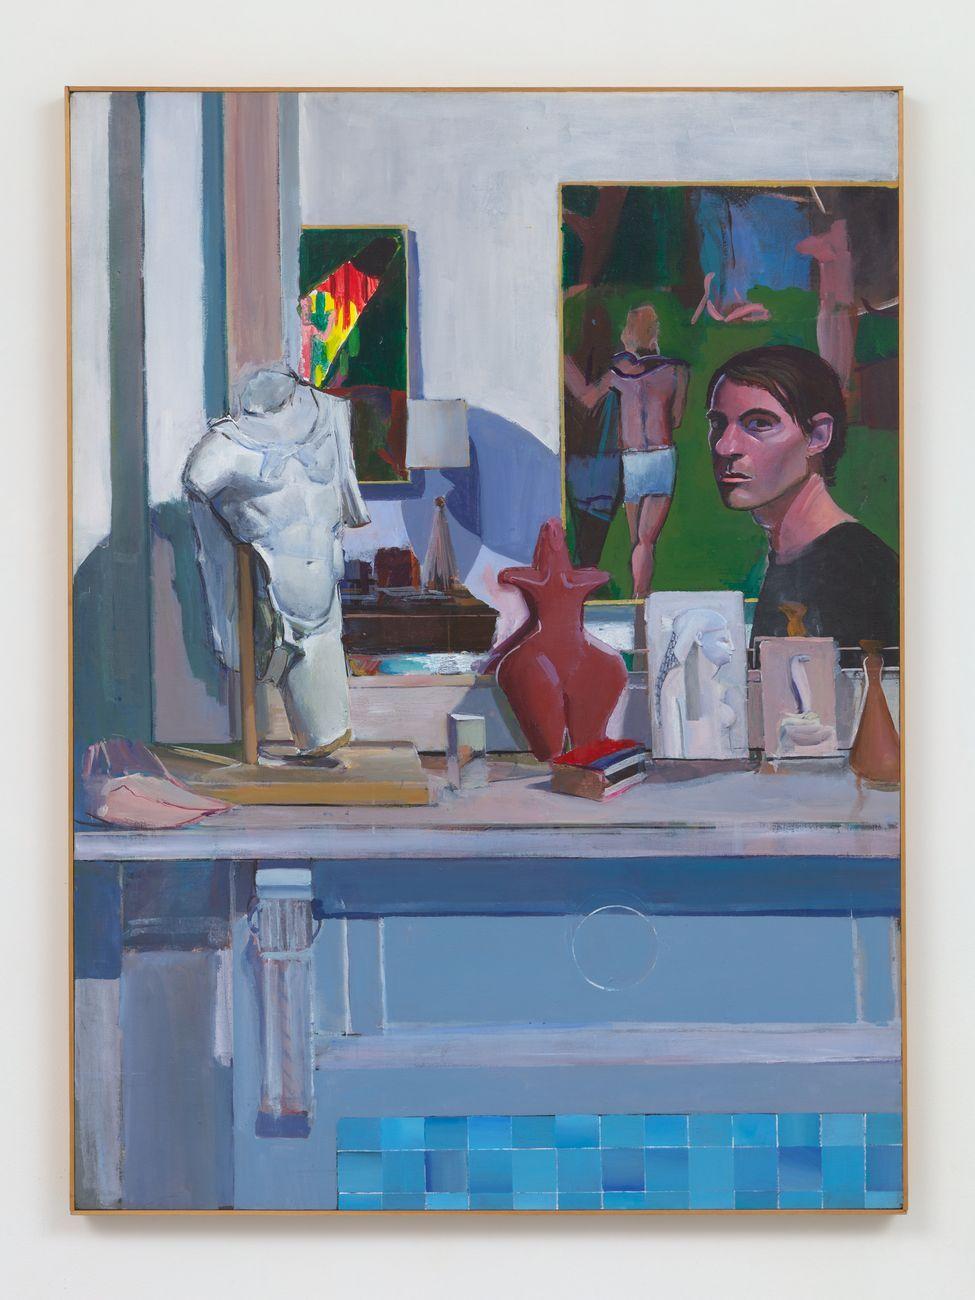 Patrick Angus, Self Portrait as Picasso, 1980, acrilico su tela, 139.7 x 104 x 4.4 cm. Courtesy of Bortolami Gallery, New York